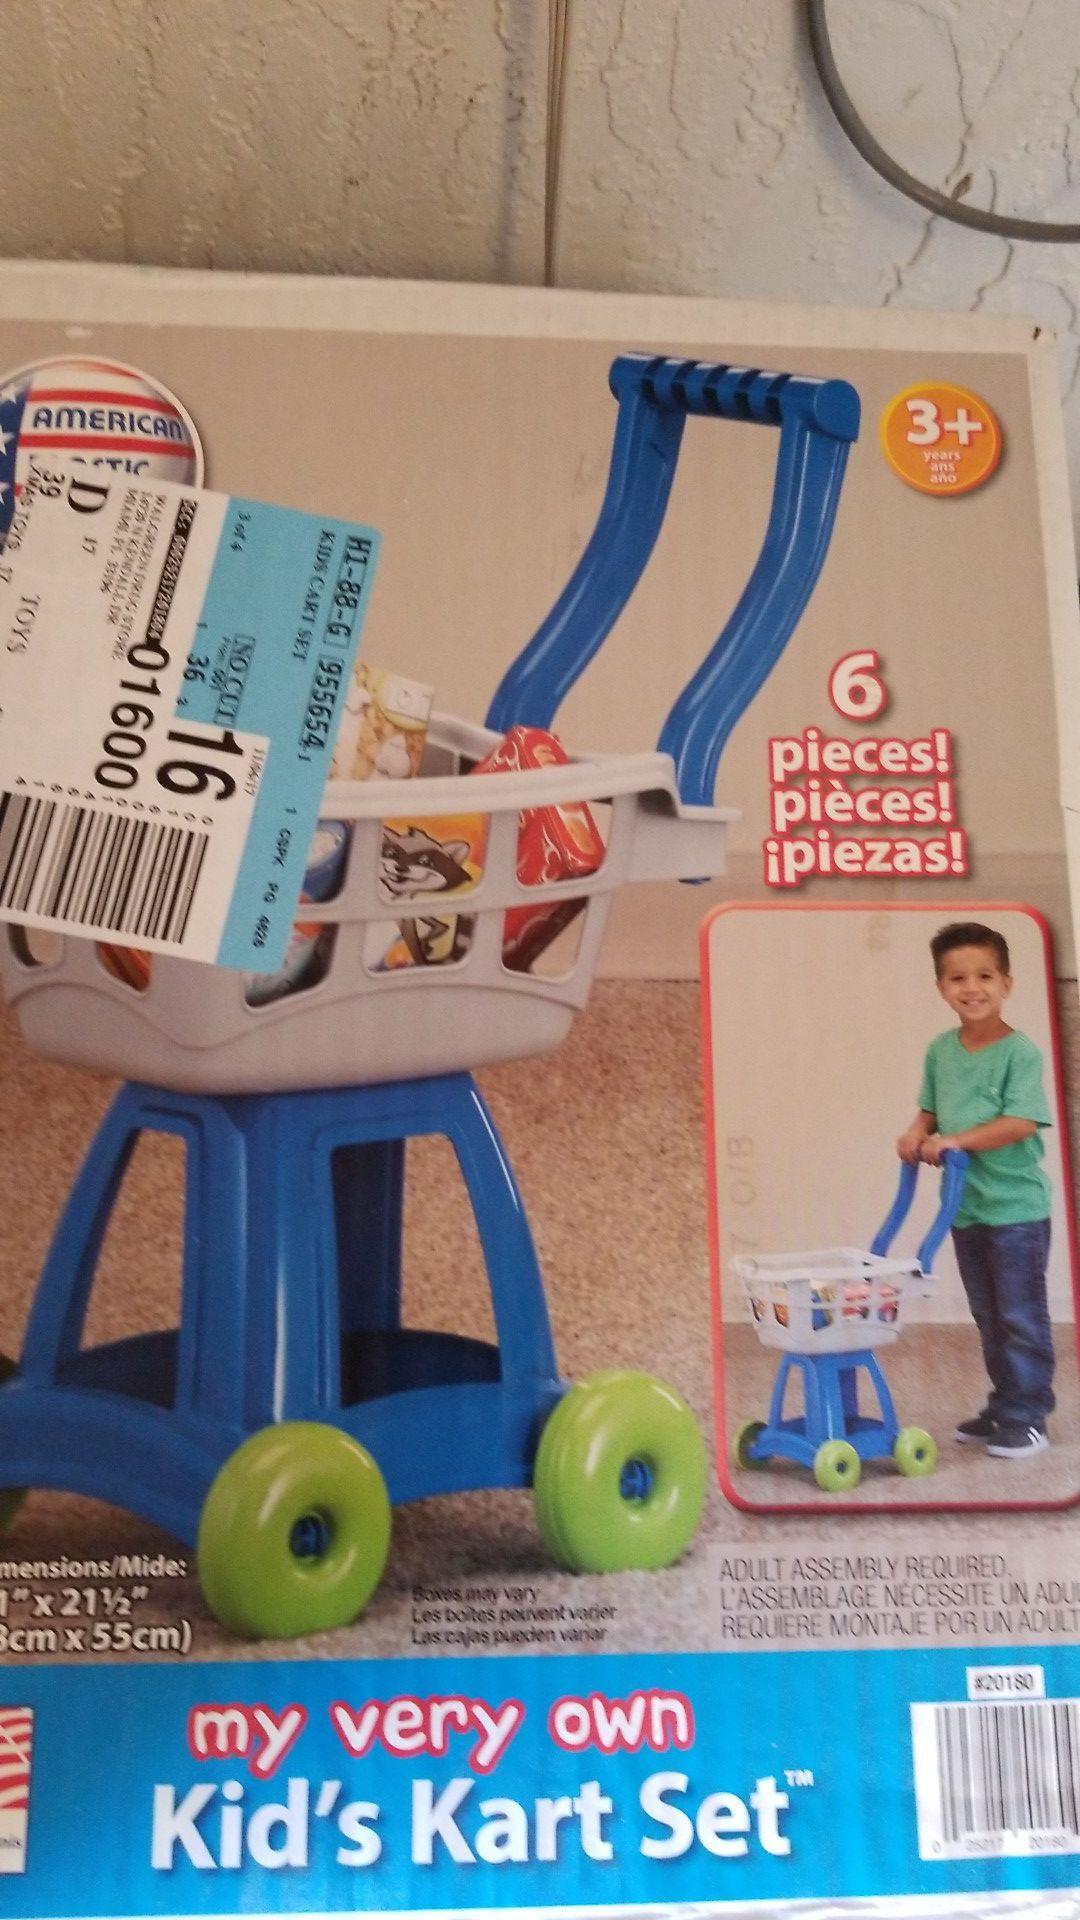 Cart set toy